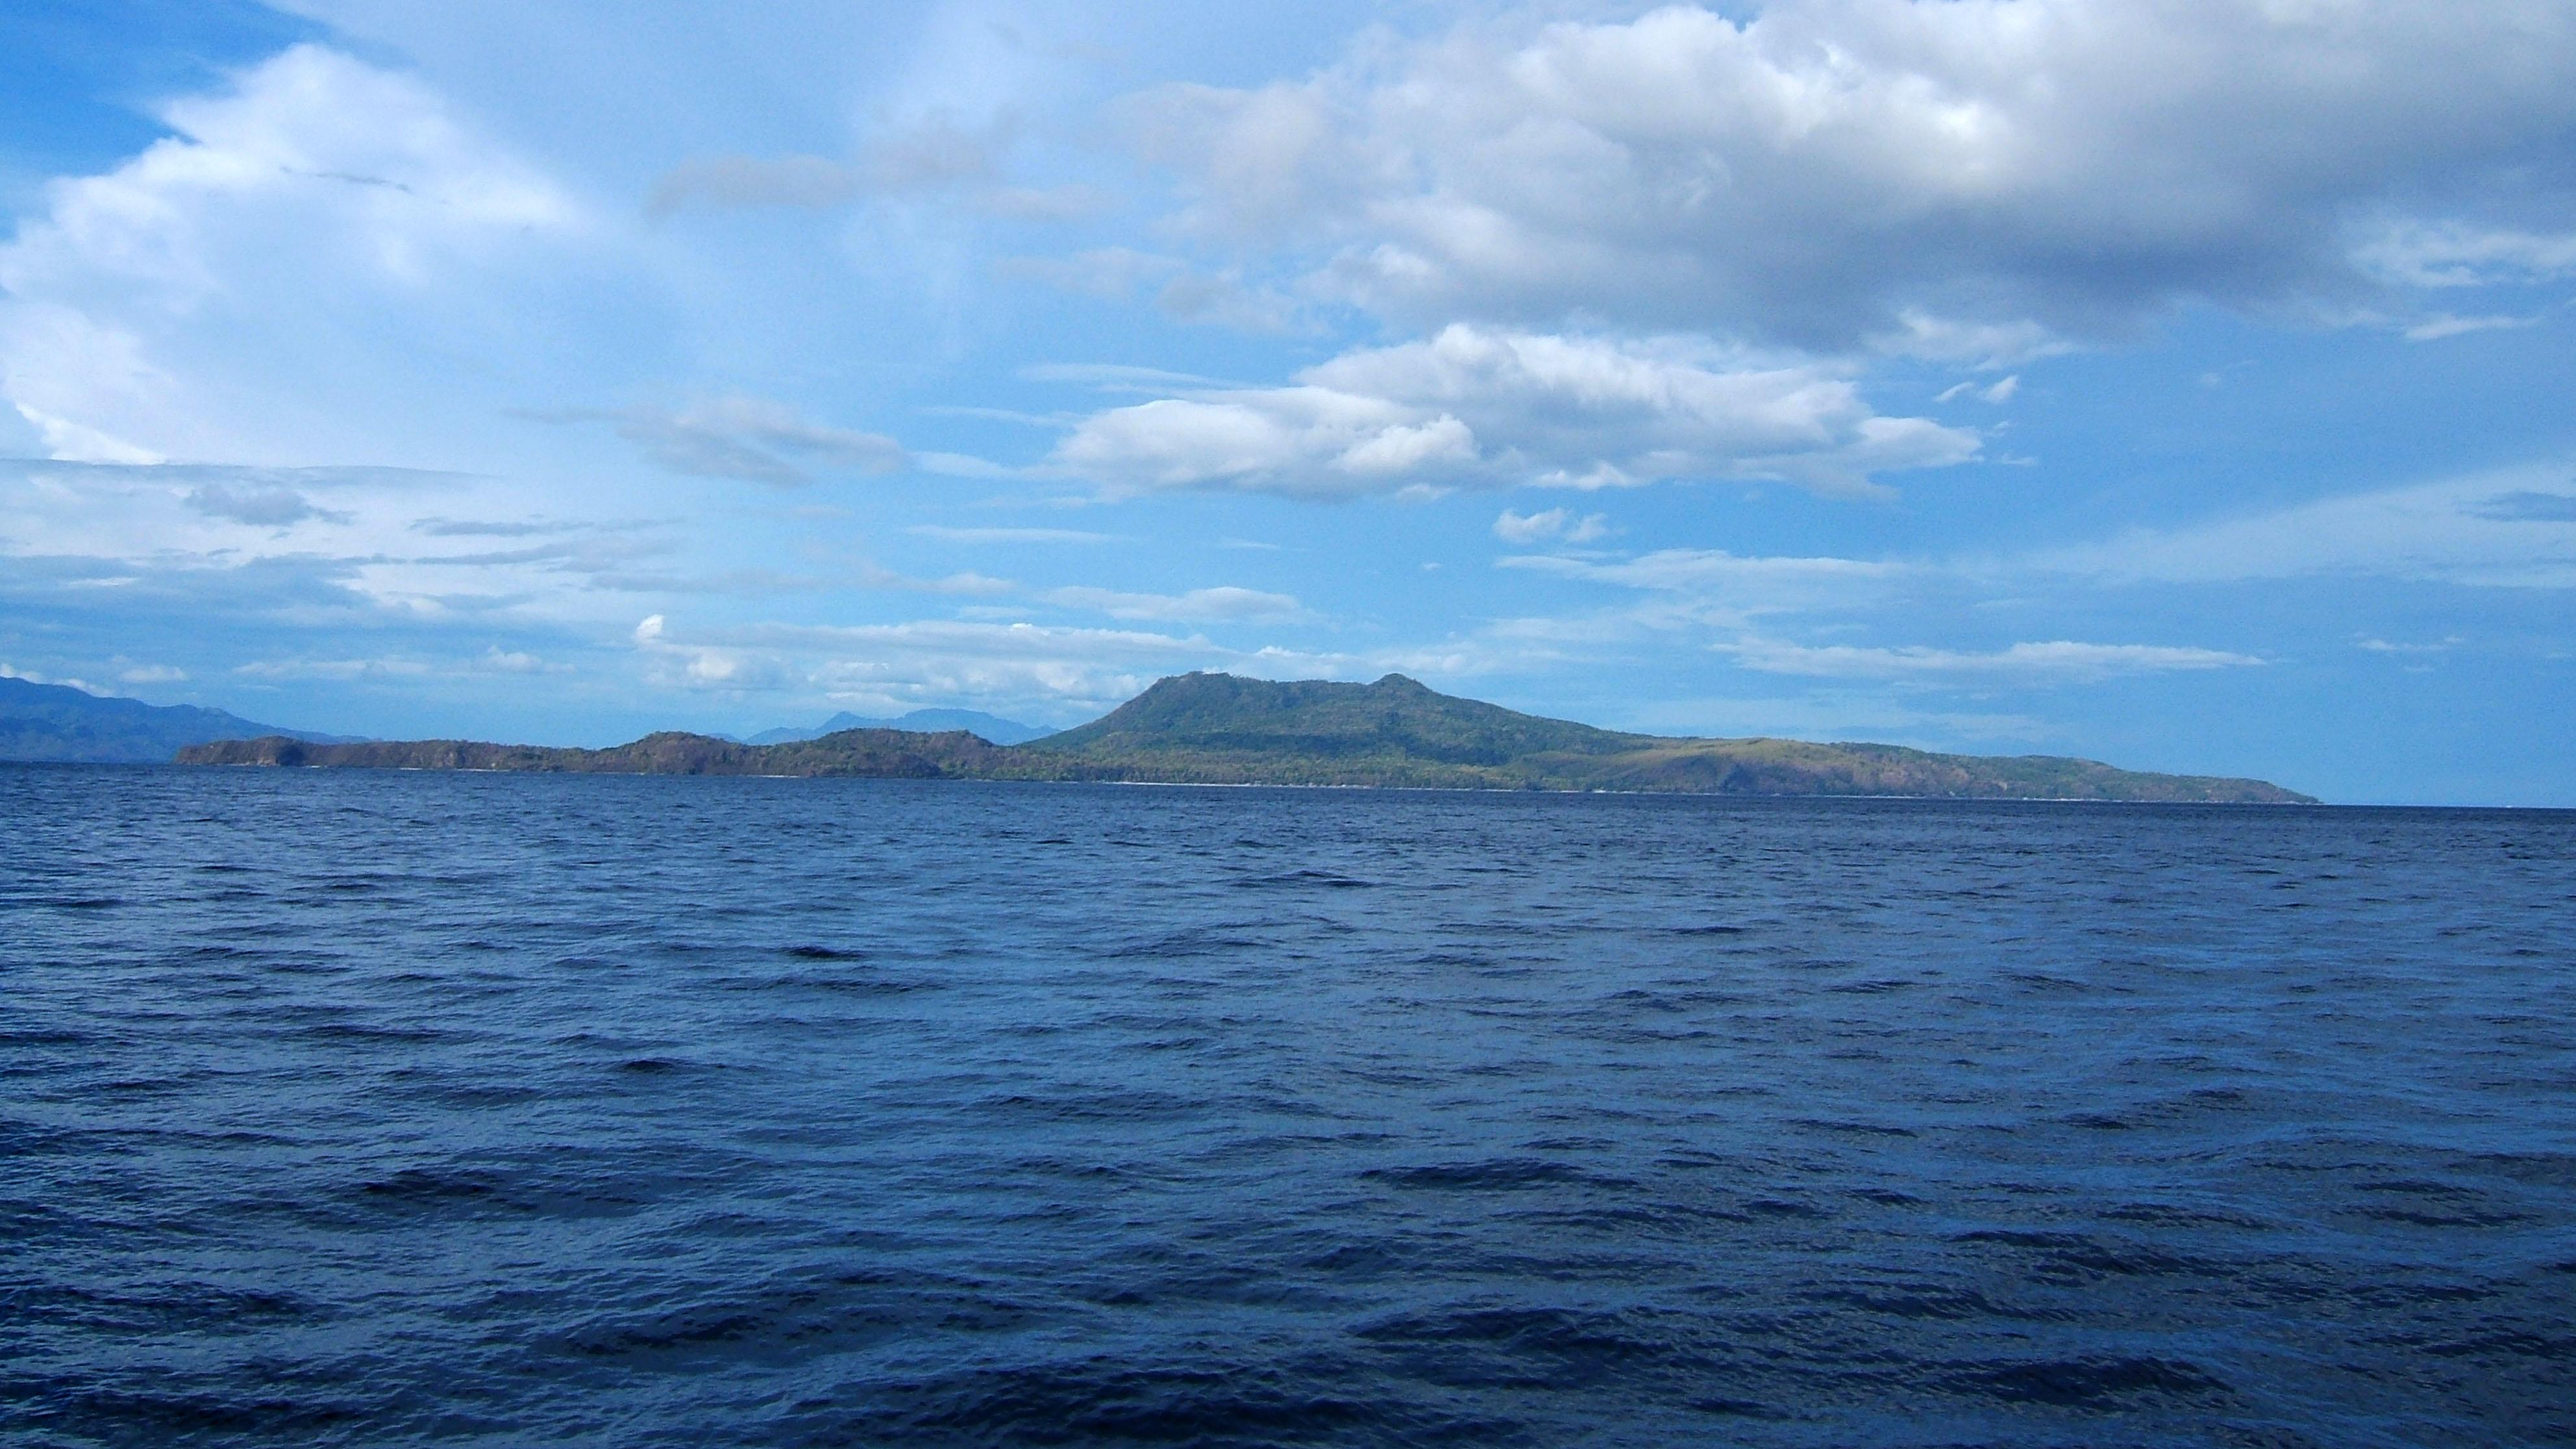 Maricahan Island Sepoc Point Batangas Philippines 02